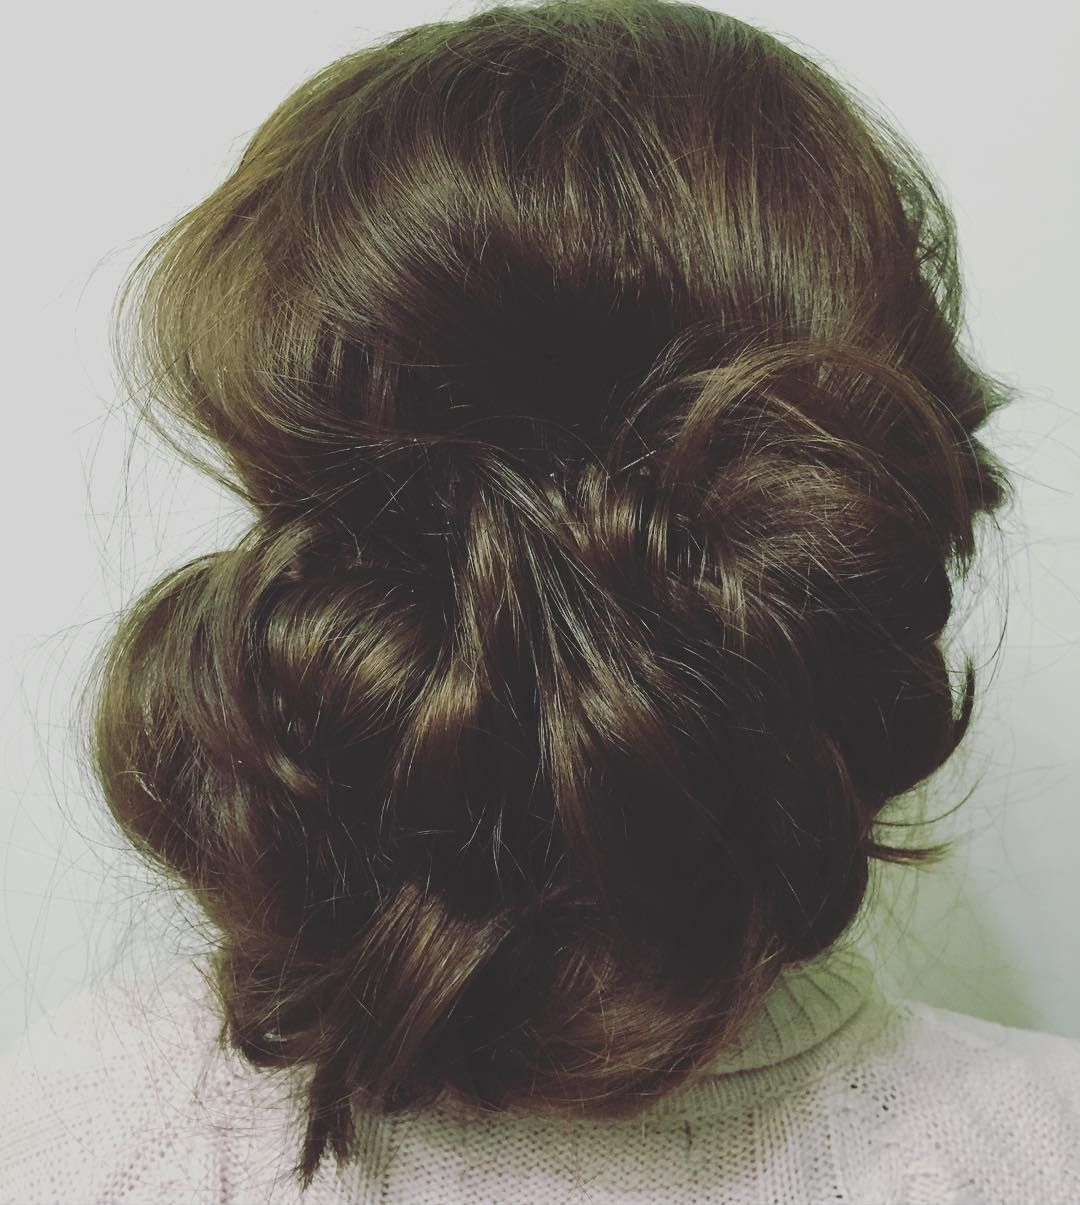 Спокойной и воздушной ночи #olliss_makes_hairs #hair_by_olliss #hair #bride #bridehair #hairstyle #hairstylist #longhair #lighthair #springhair #wedding2016 #wedding #weddingstylist #стилиствизажист #стилистпоприческам #стилиствизажистмосква #пучок #пучокизлоконов #воздушныйпучок #низкийпучок #невеста2016 #невеста #свадьба #свадьба2016 #стилистнасвадьбу #прическимосква #локоны #ищумодель #tfp by olliss